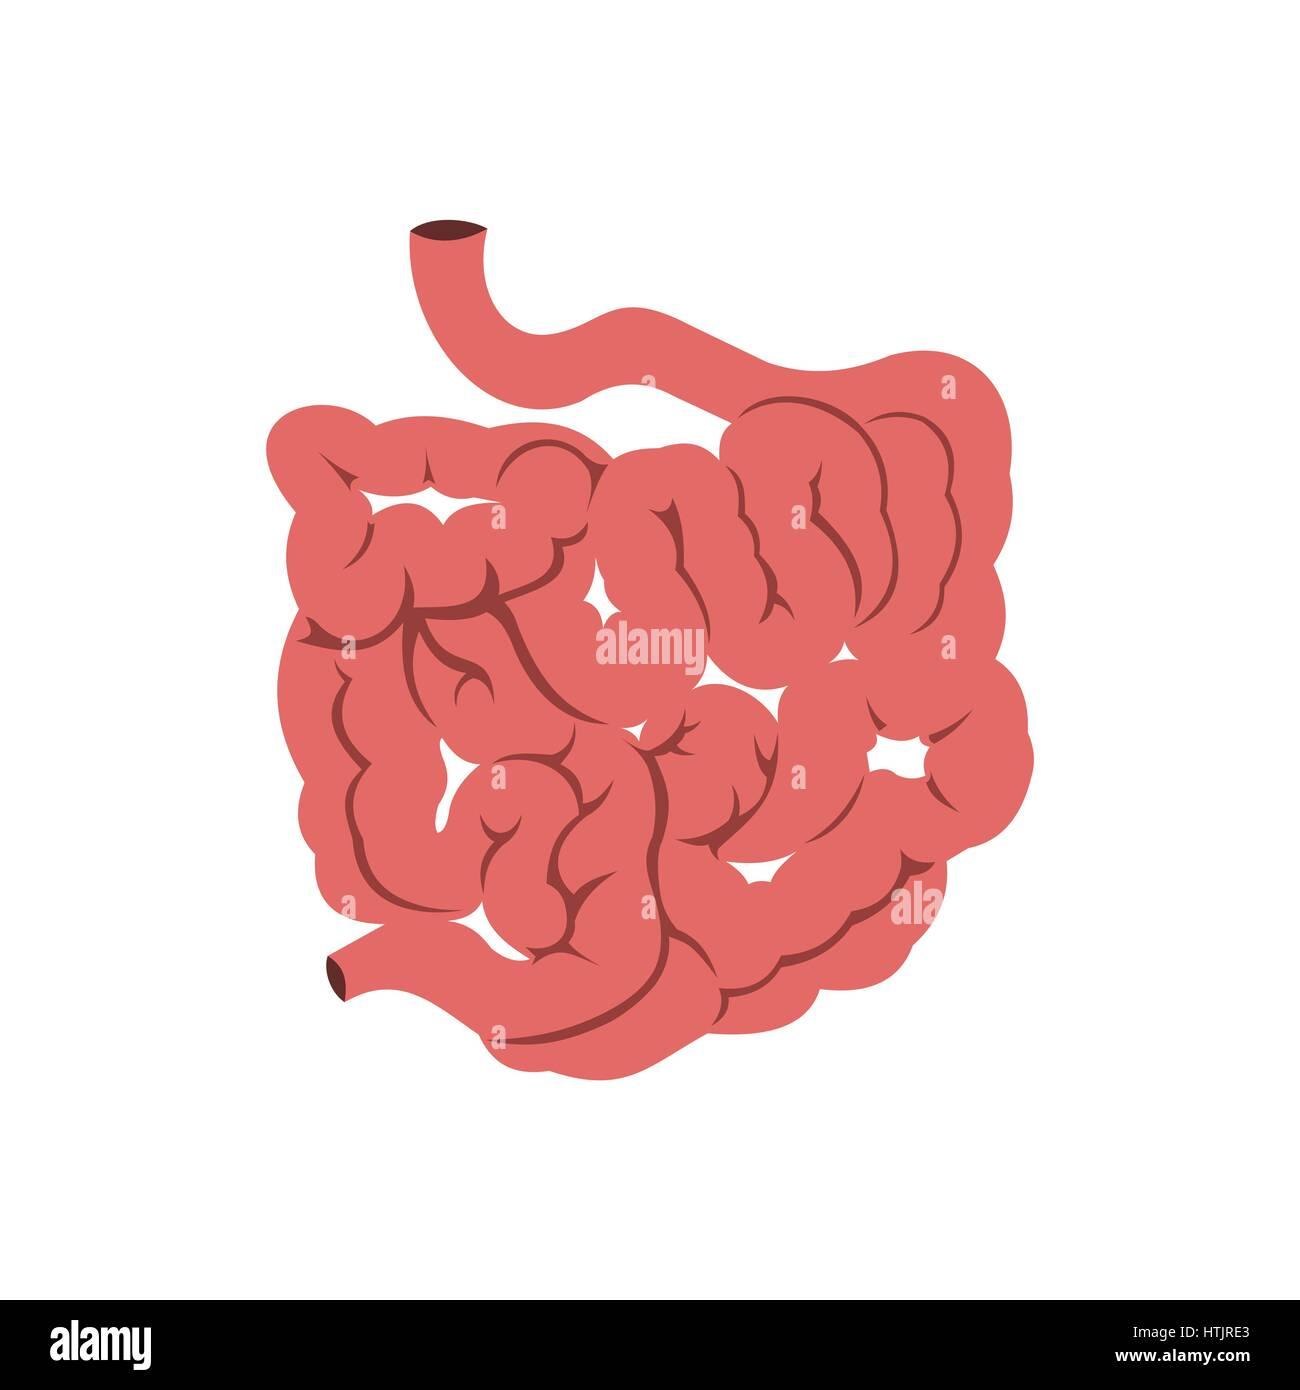 Digestive Small Large Intestine Drawing Stock Photos